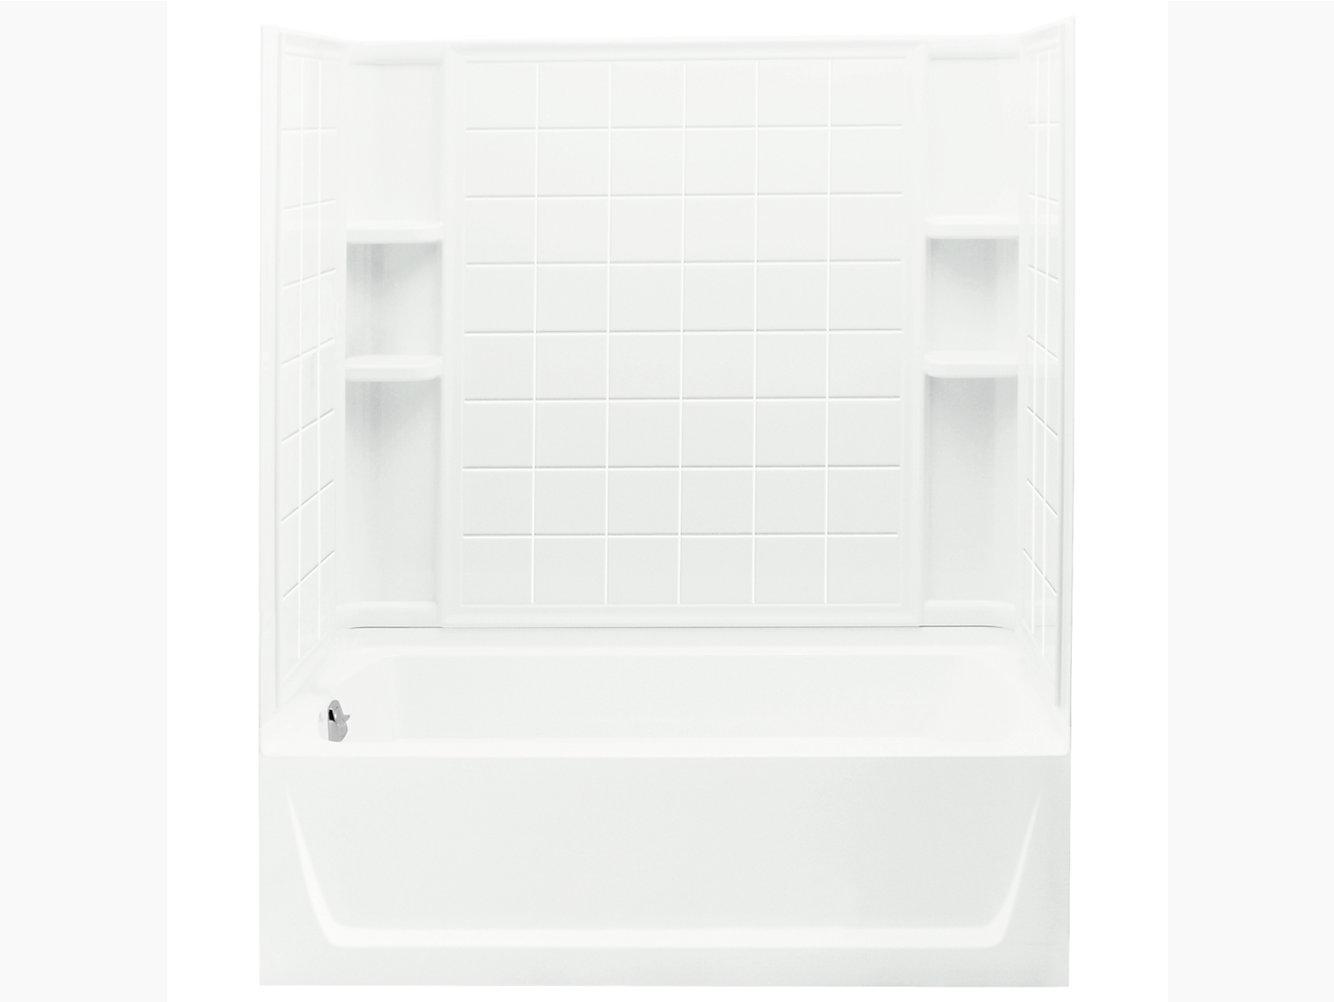 Ensemble Series 7112 60 X 32 74 Tile Bath Shower Left Hand Drain 71120170 Sterling